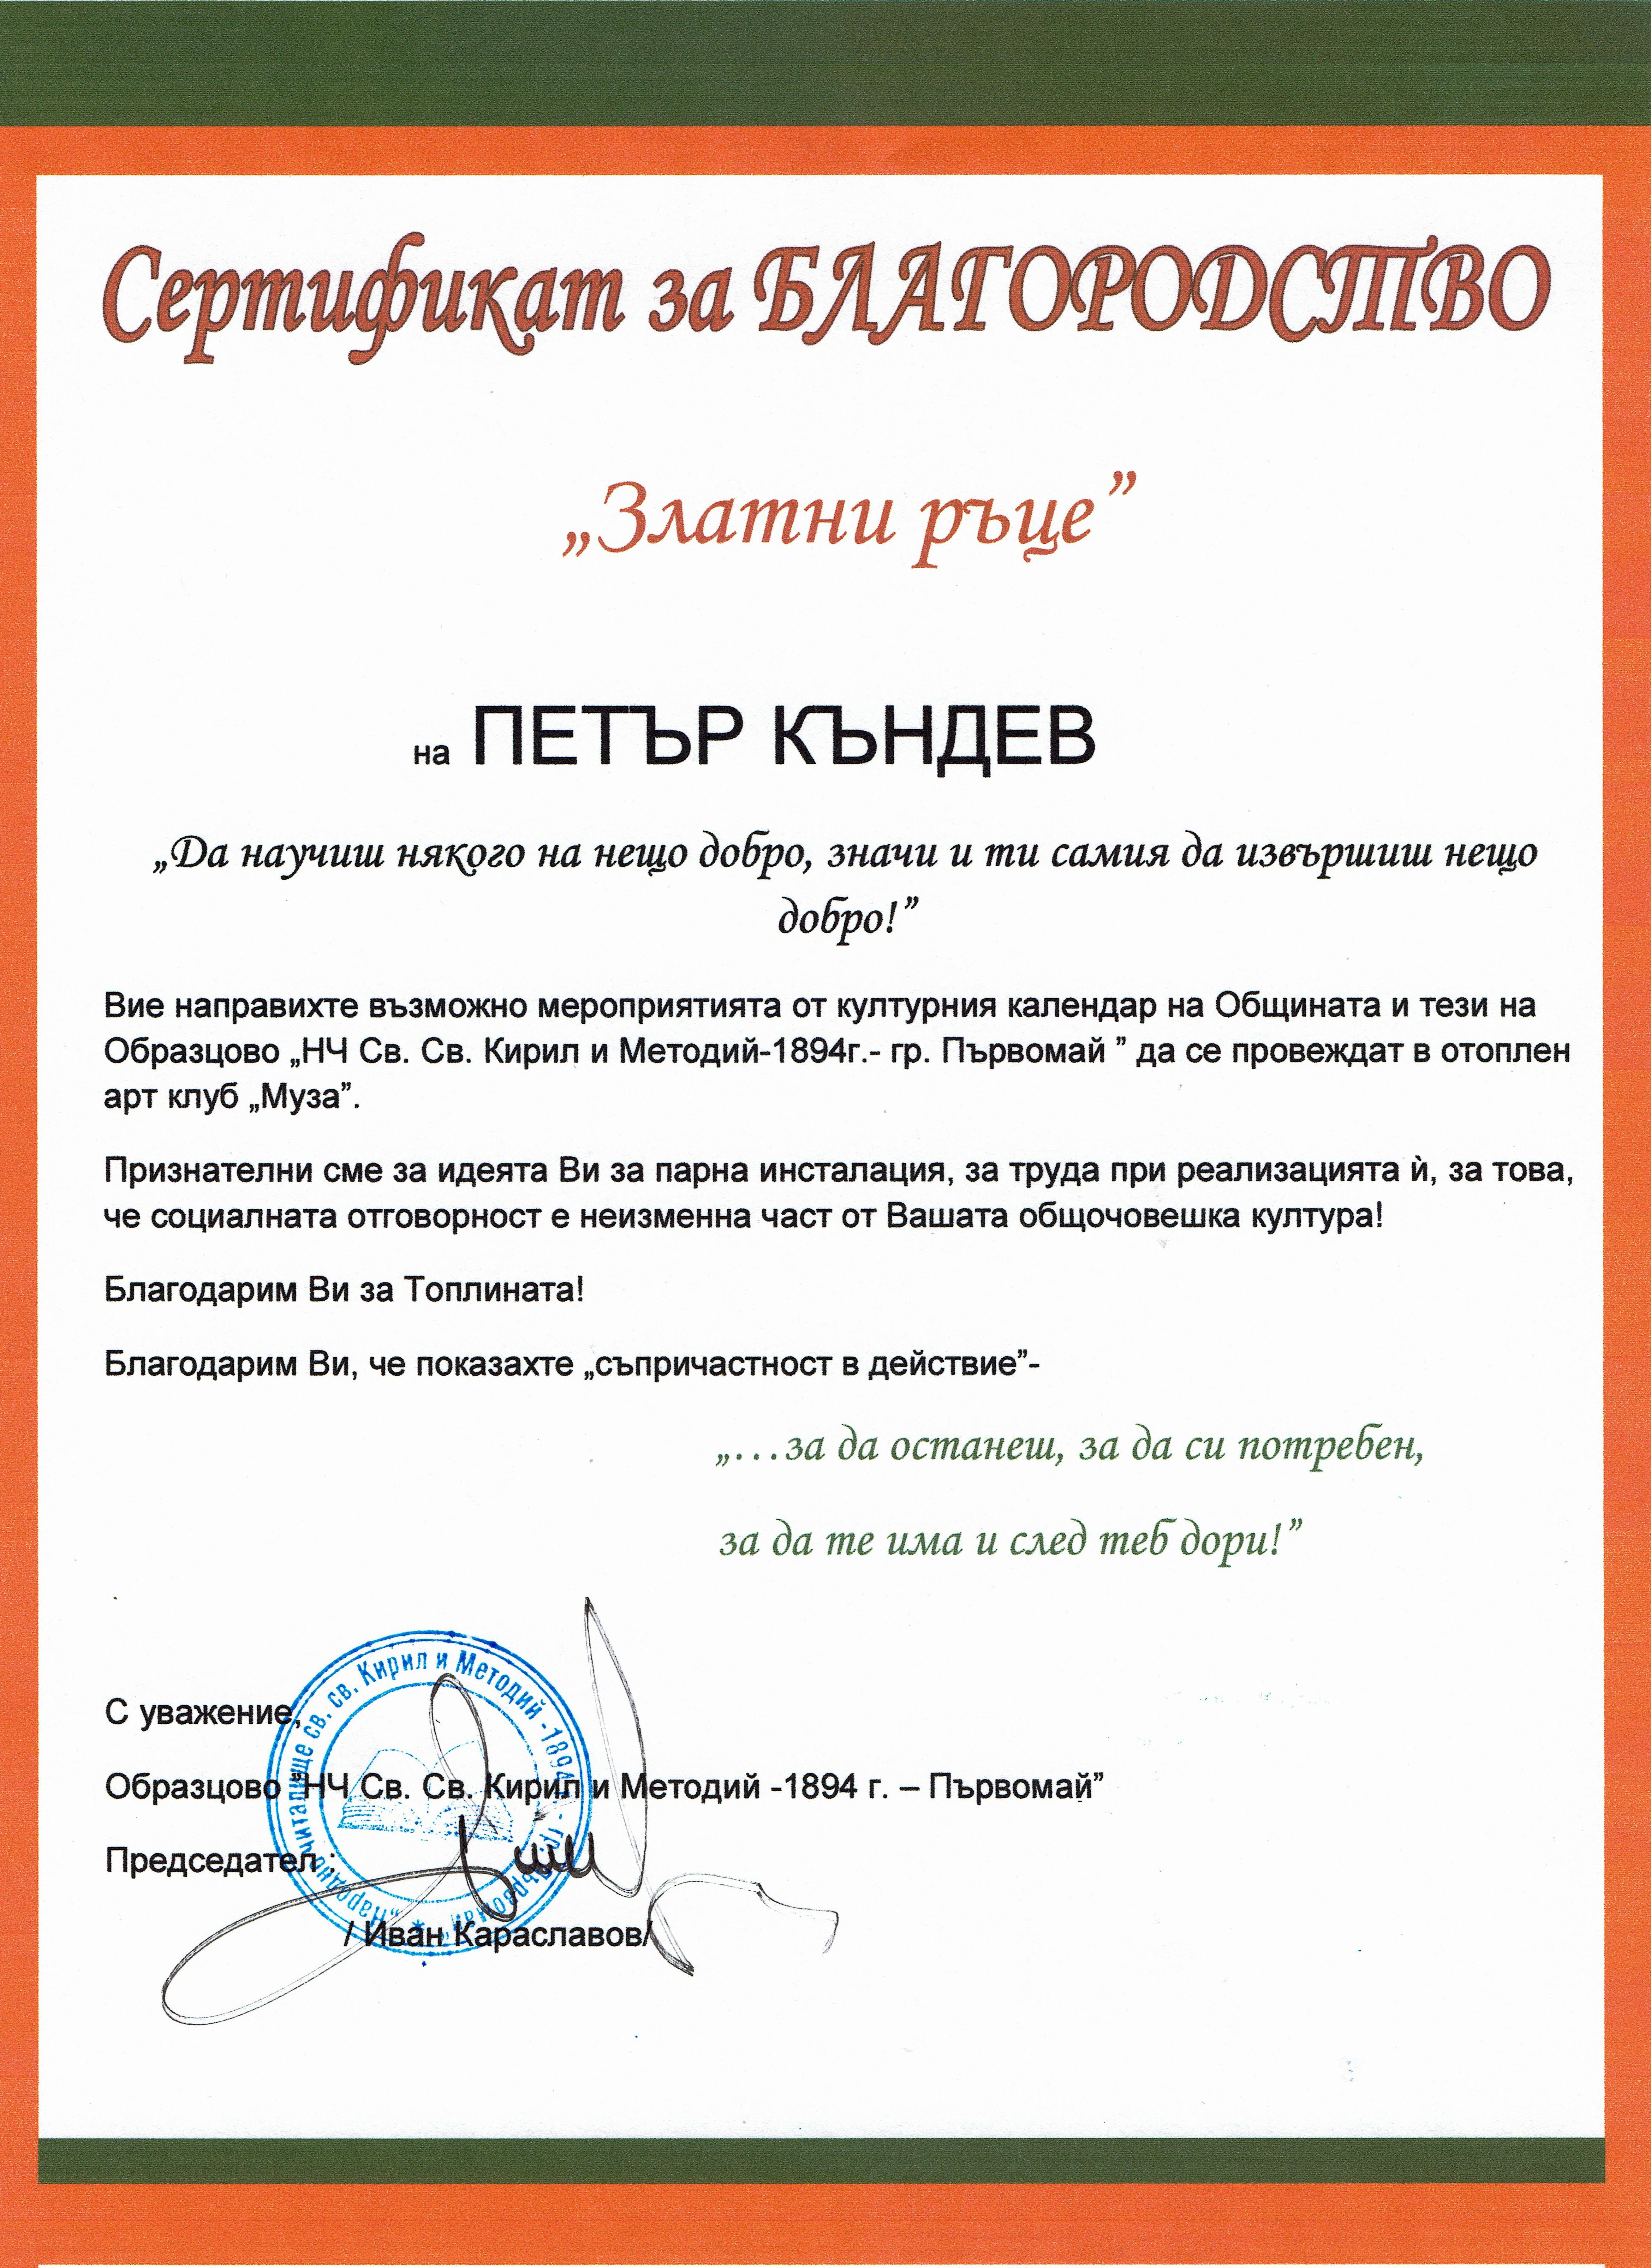 СЕРТИФИКАТ03032019